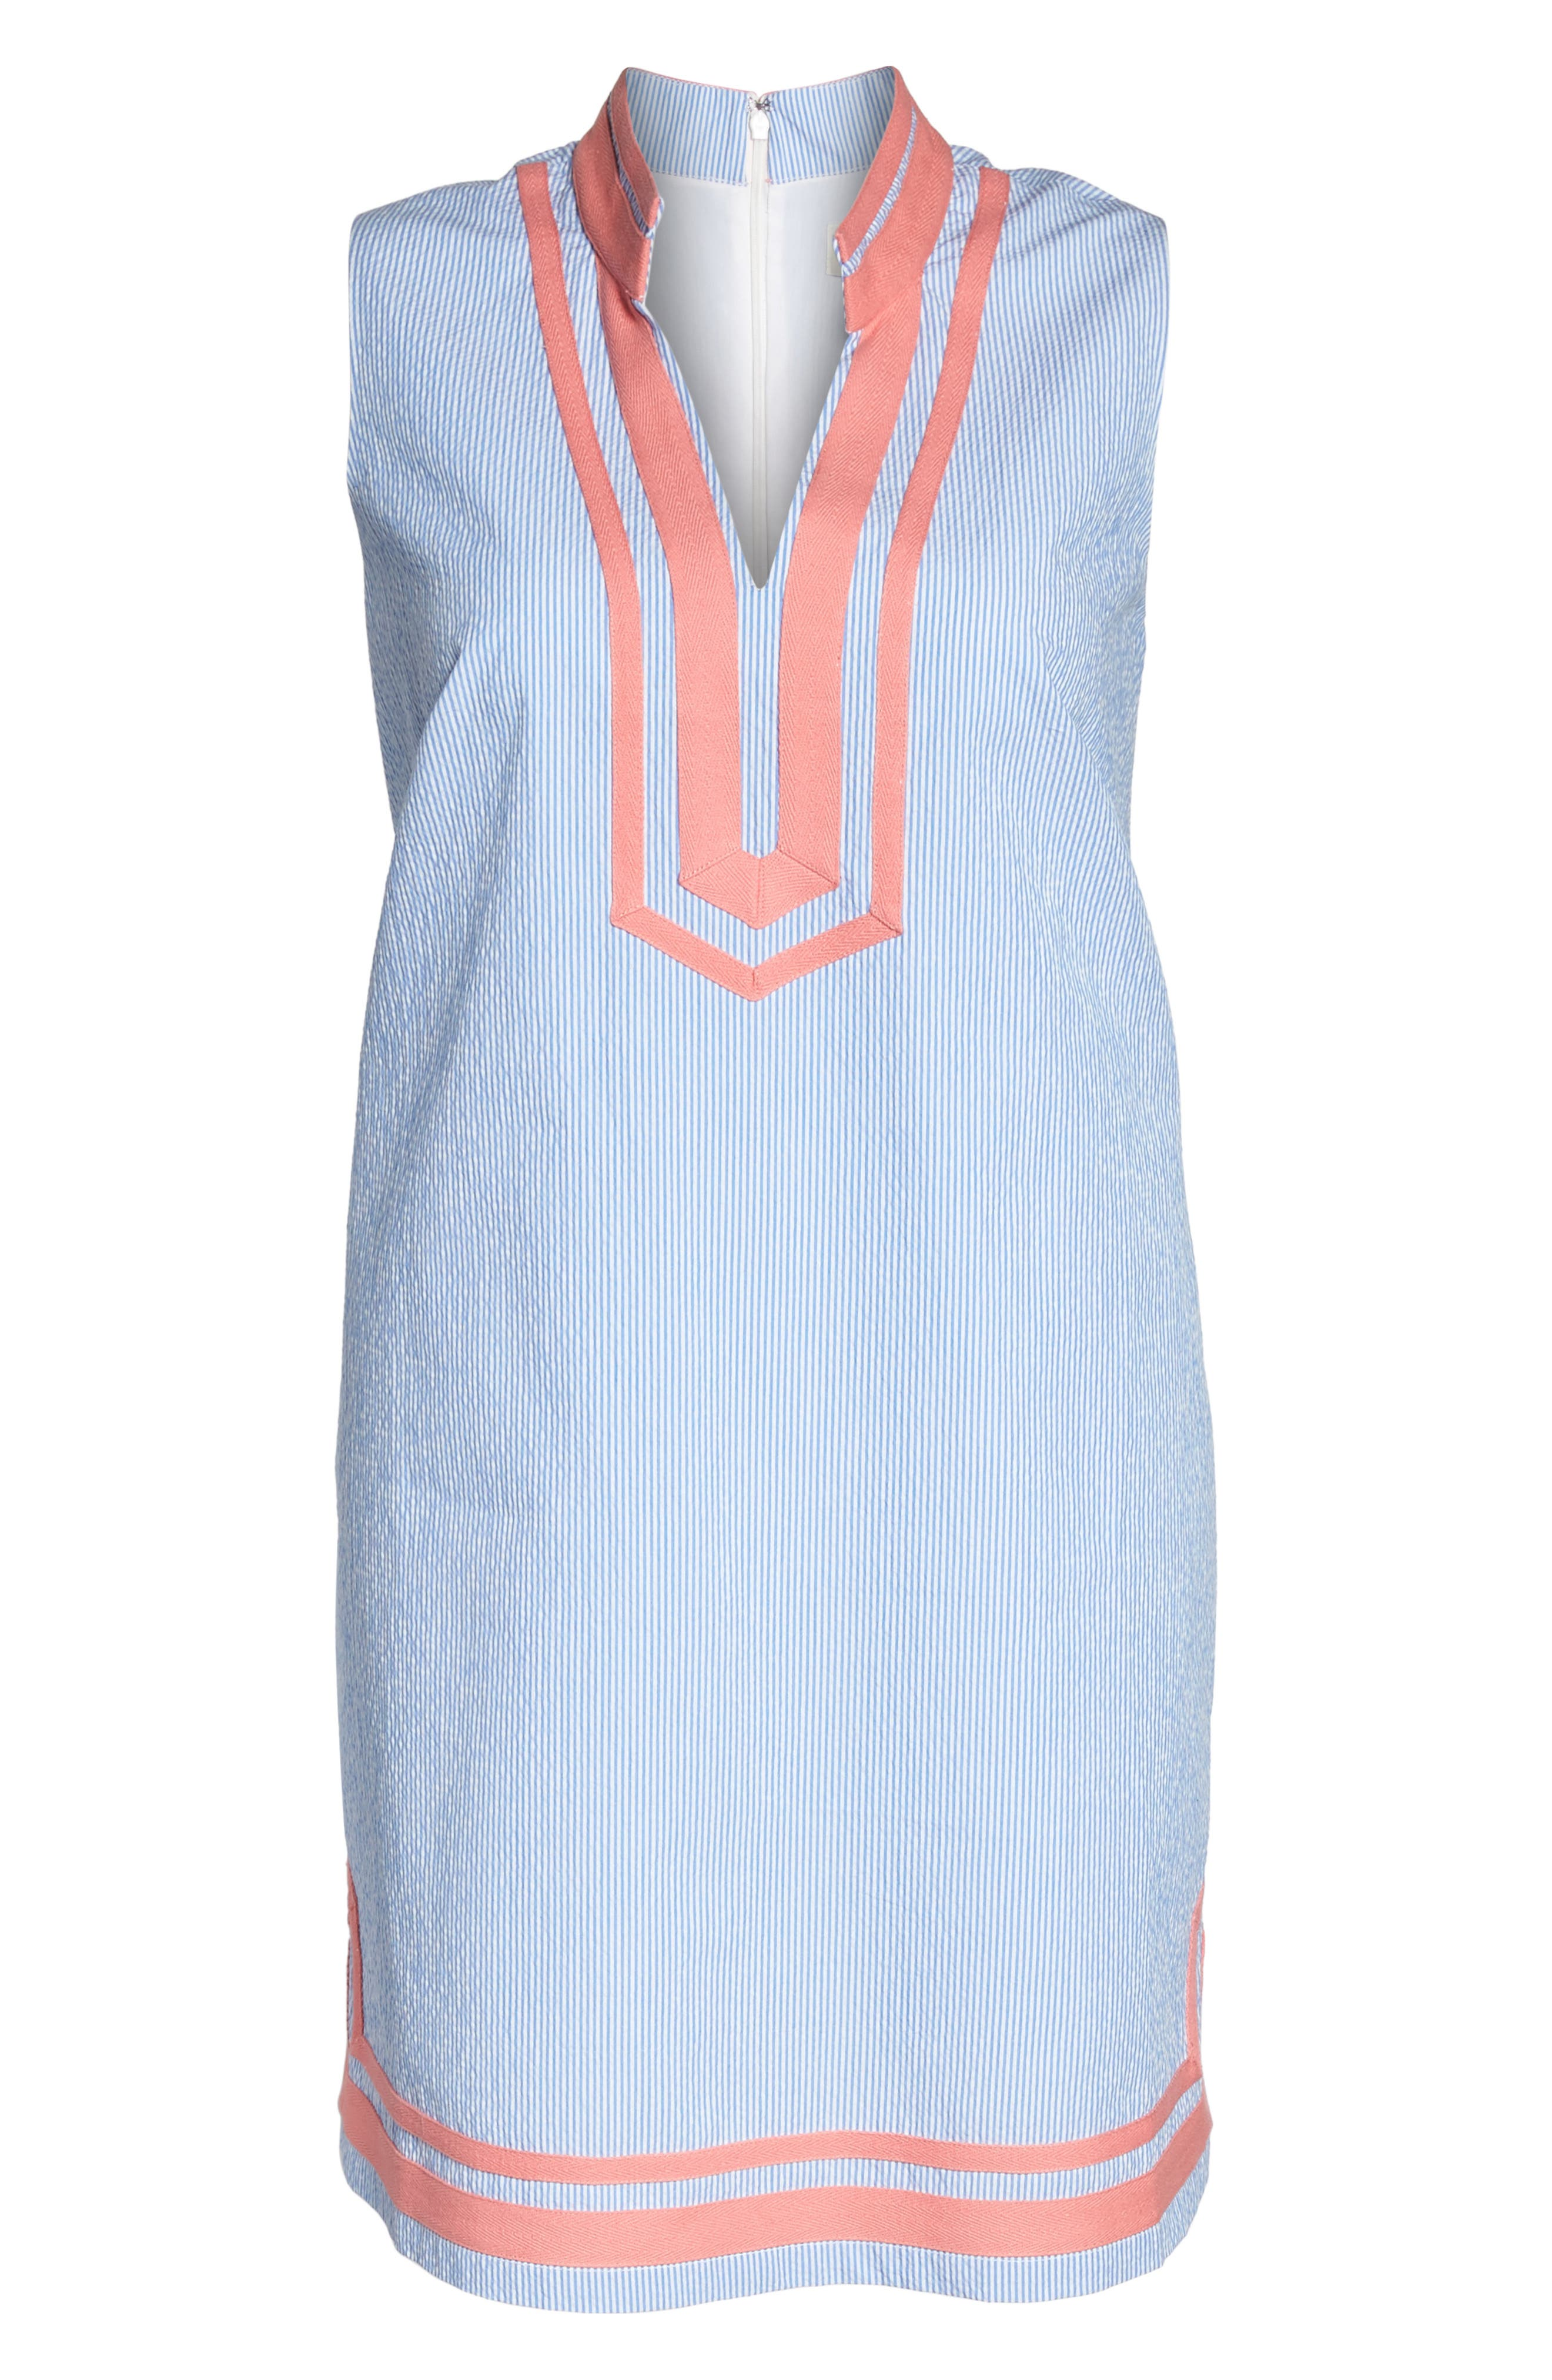 Mandarin Collar Contrast Trim Seersucker Shift Dress,                             Alternate thumbnail 6, color,